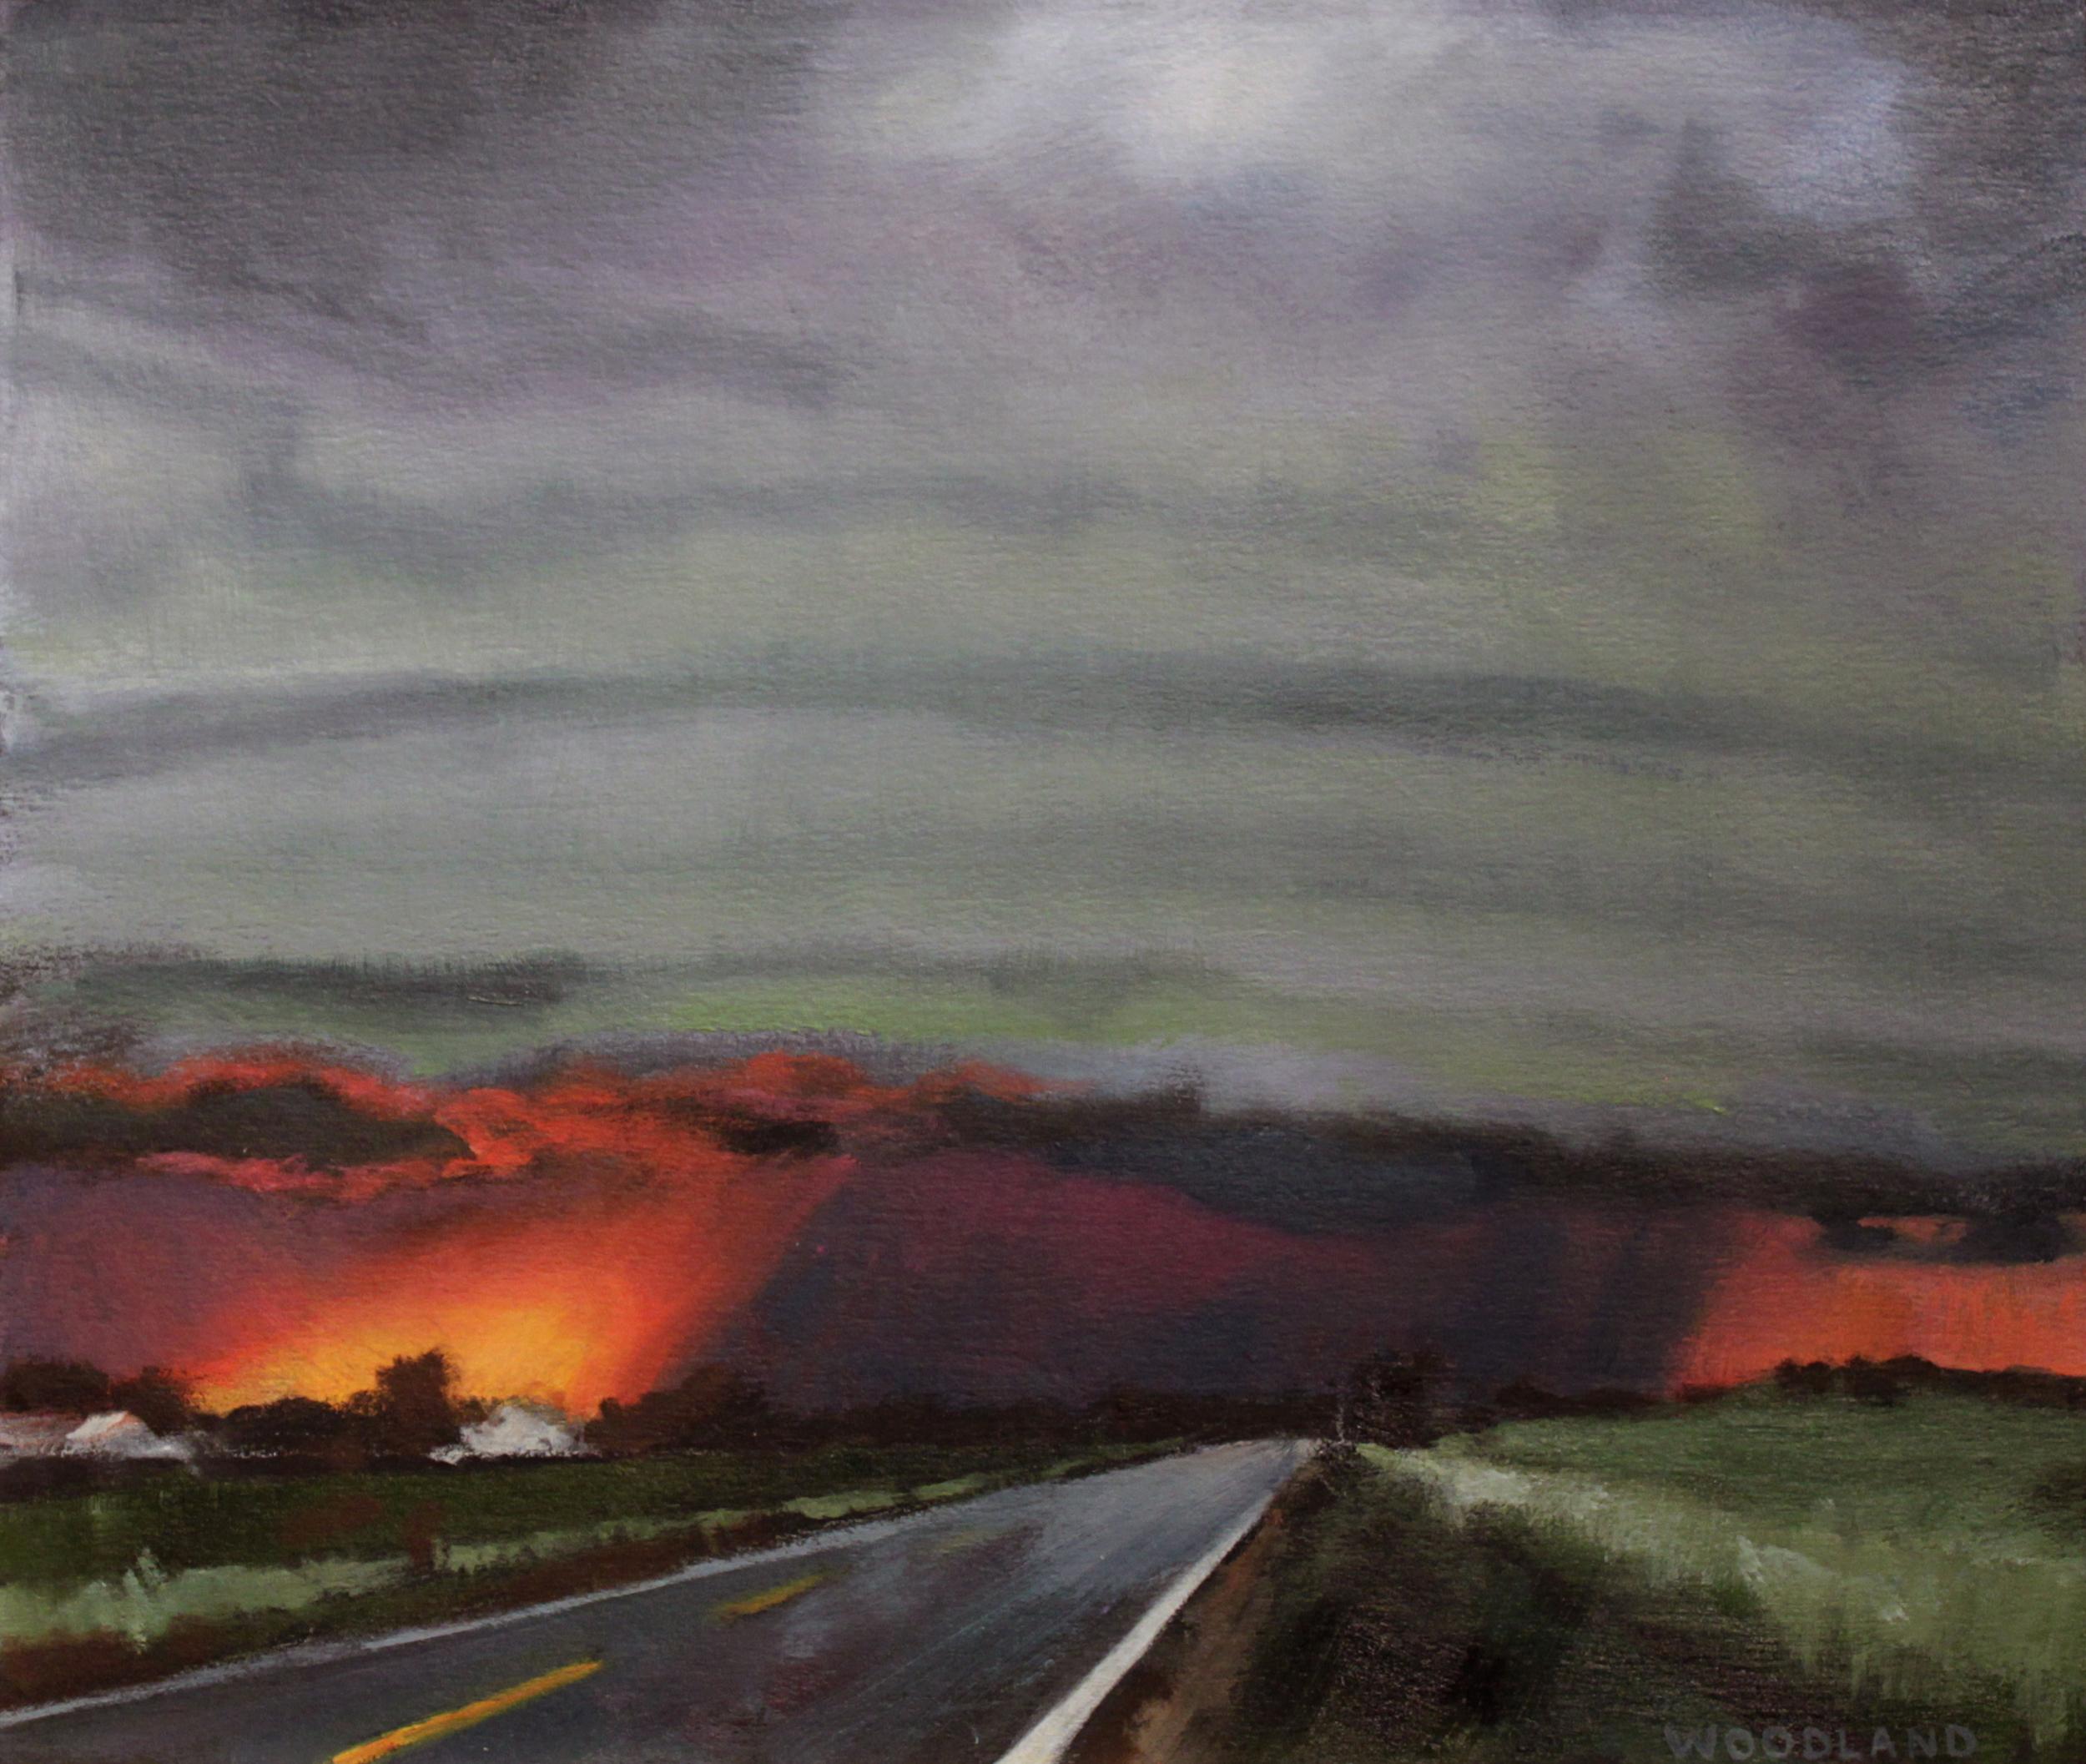 BW-009, Bette Woodland, Gust Front, Oil on Artboard, 2011, 8 x 10.jpg